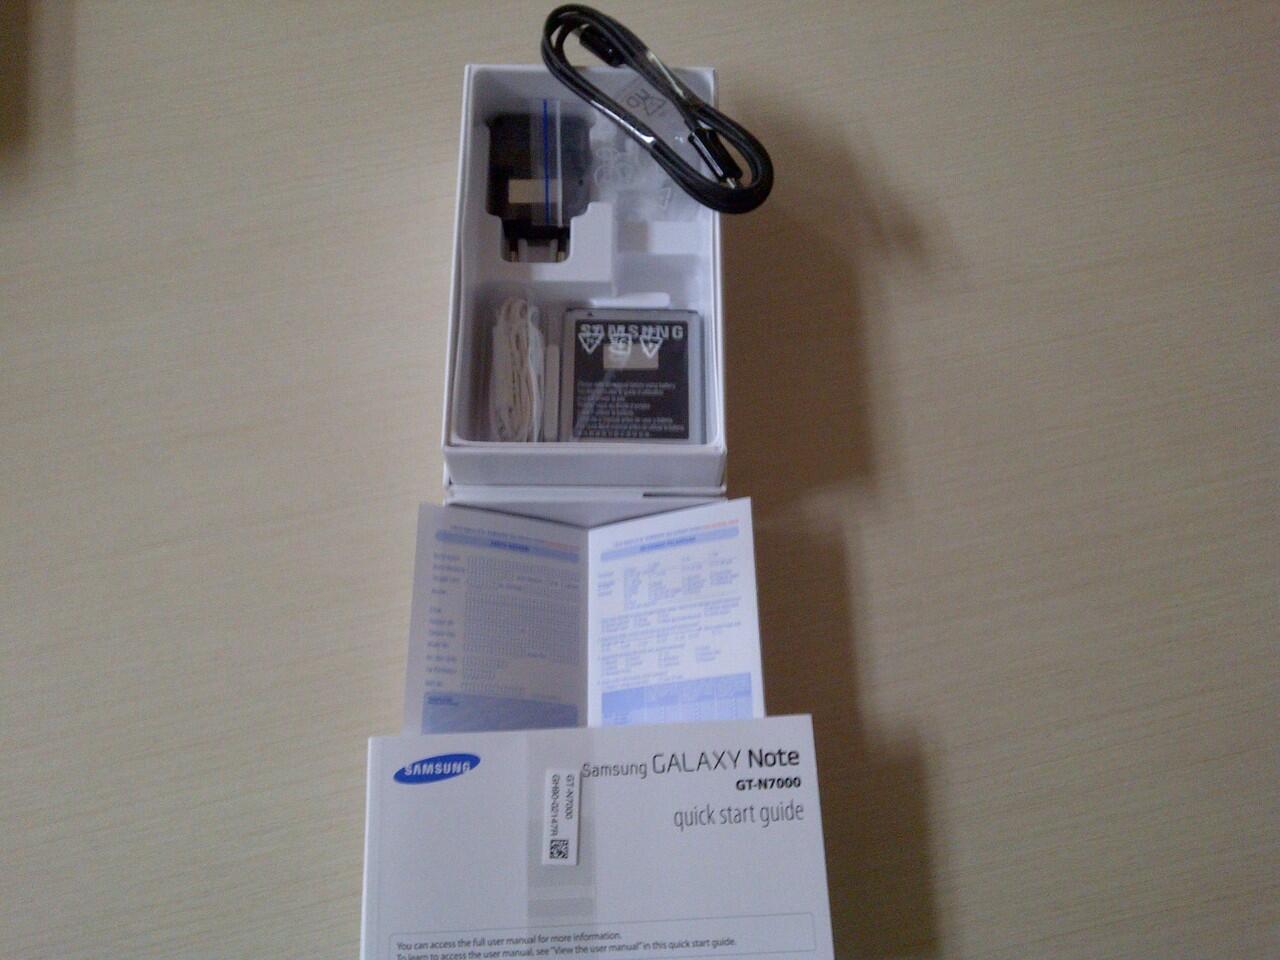 Jual Samsung Galaxy Note (Baru/BNIB) Termurah Se-Kaskus